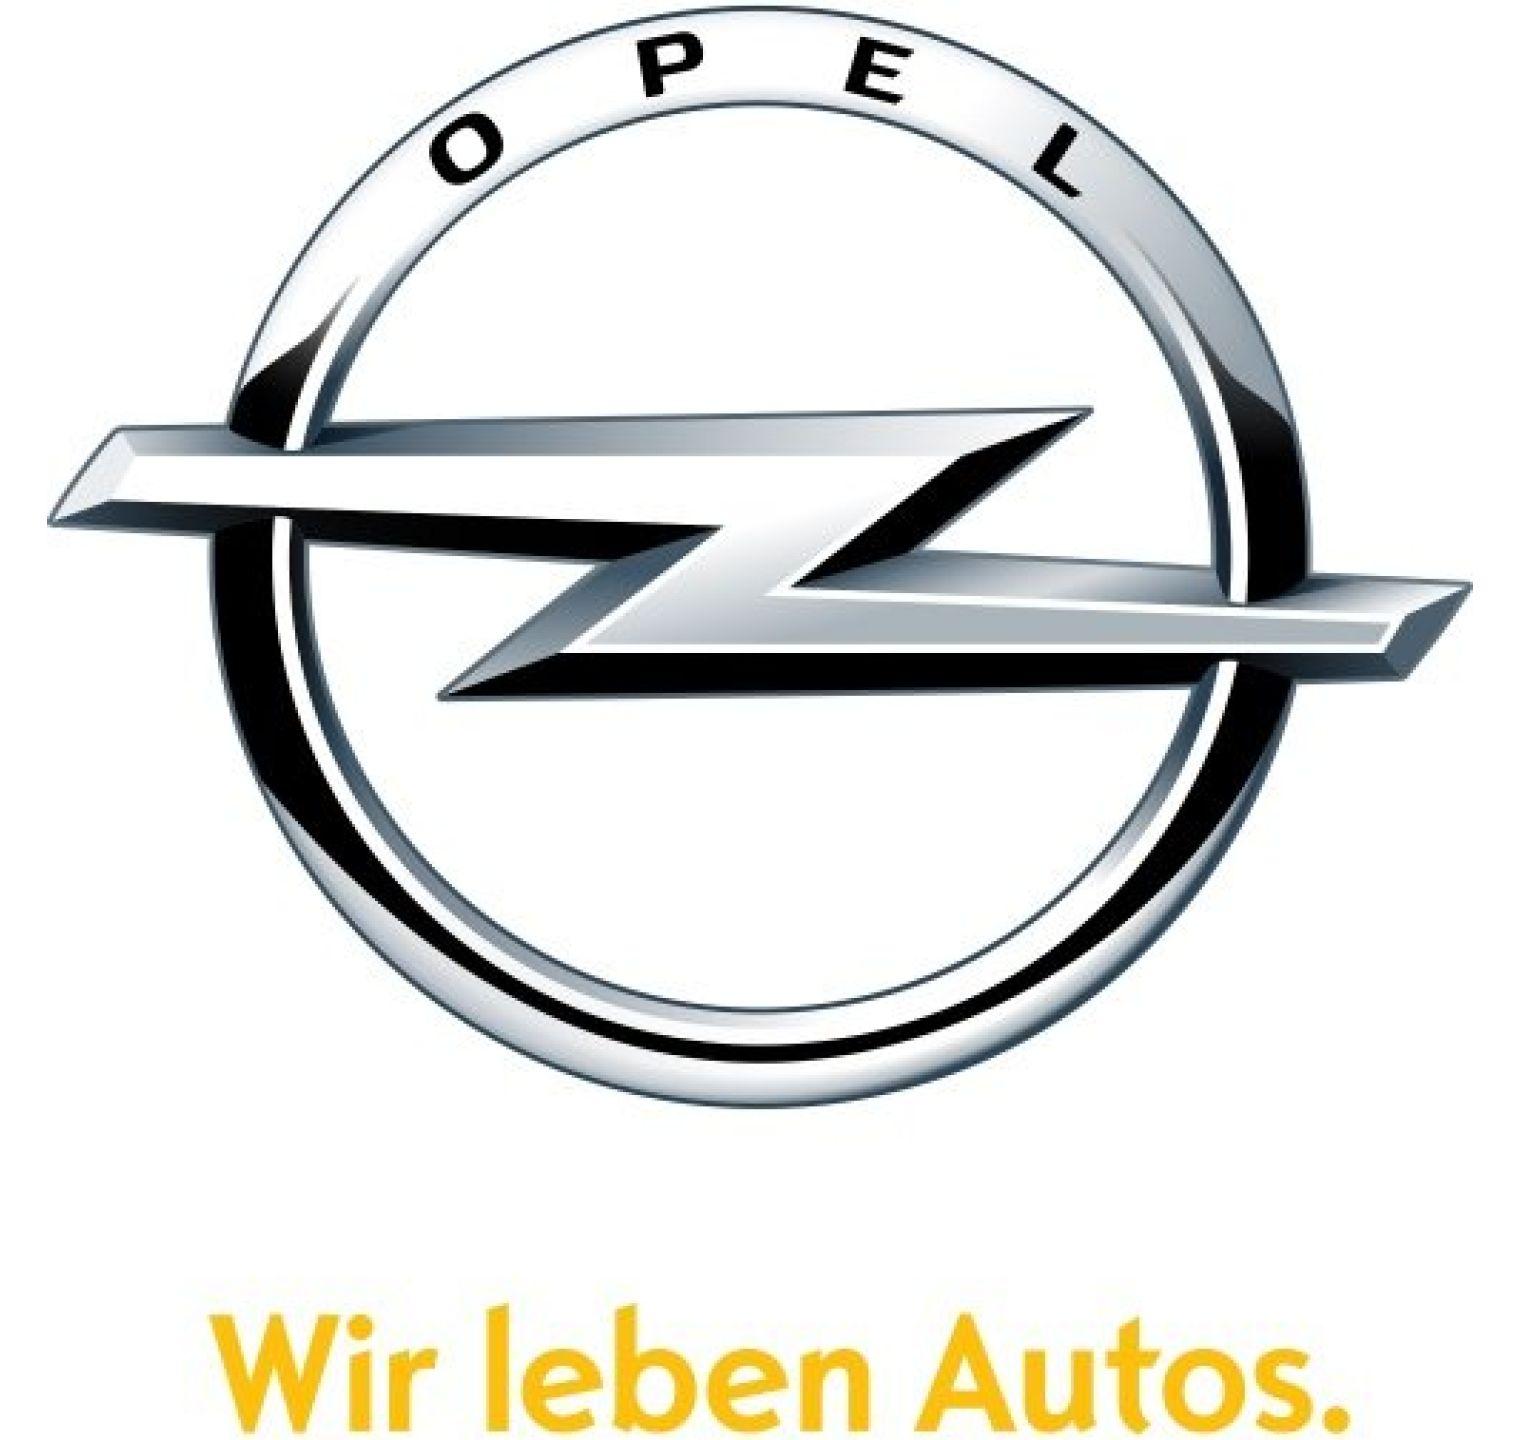 Opel Movano Open Laadbak/ Chassis (vanaf 2006) - set ruitenwissers Valeo Performance